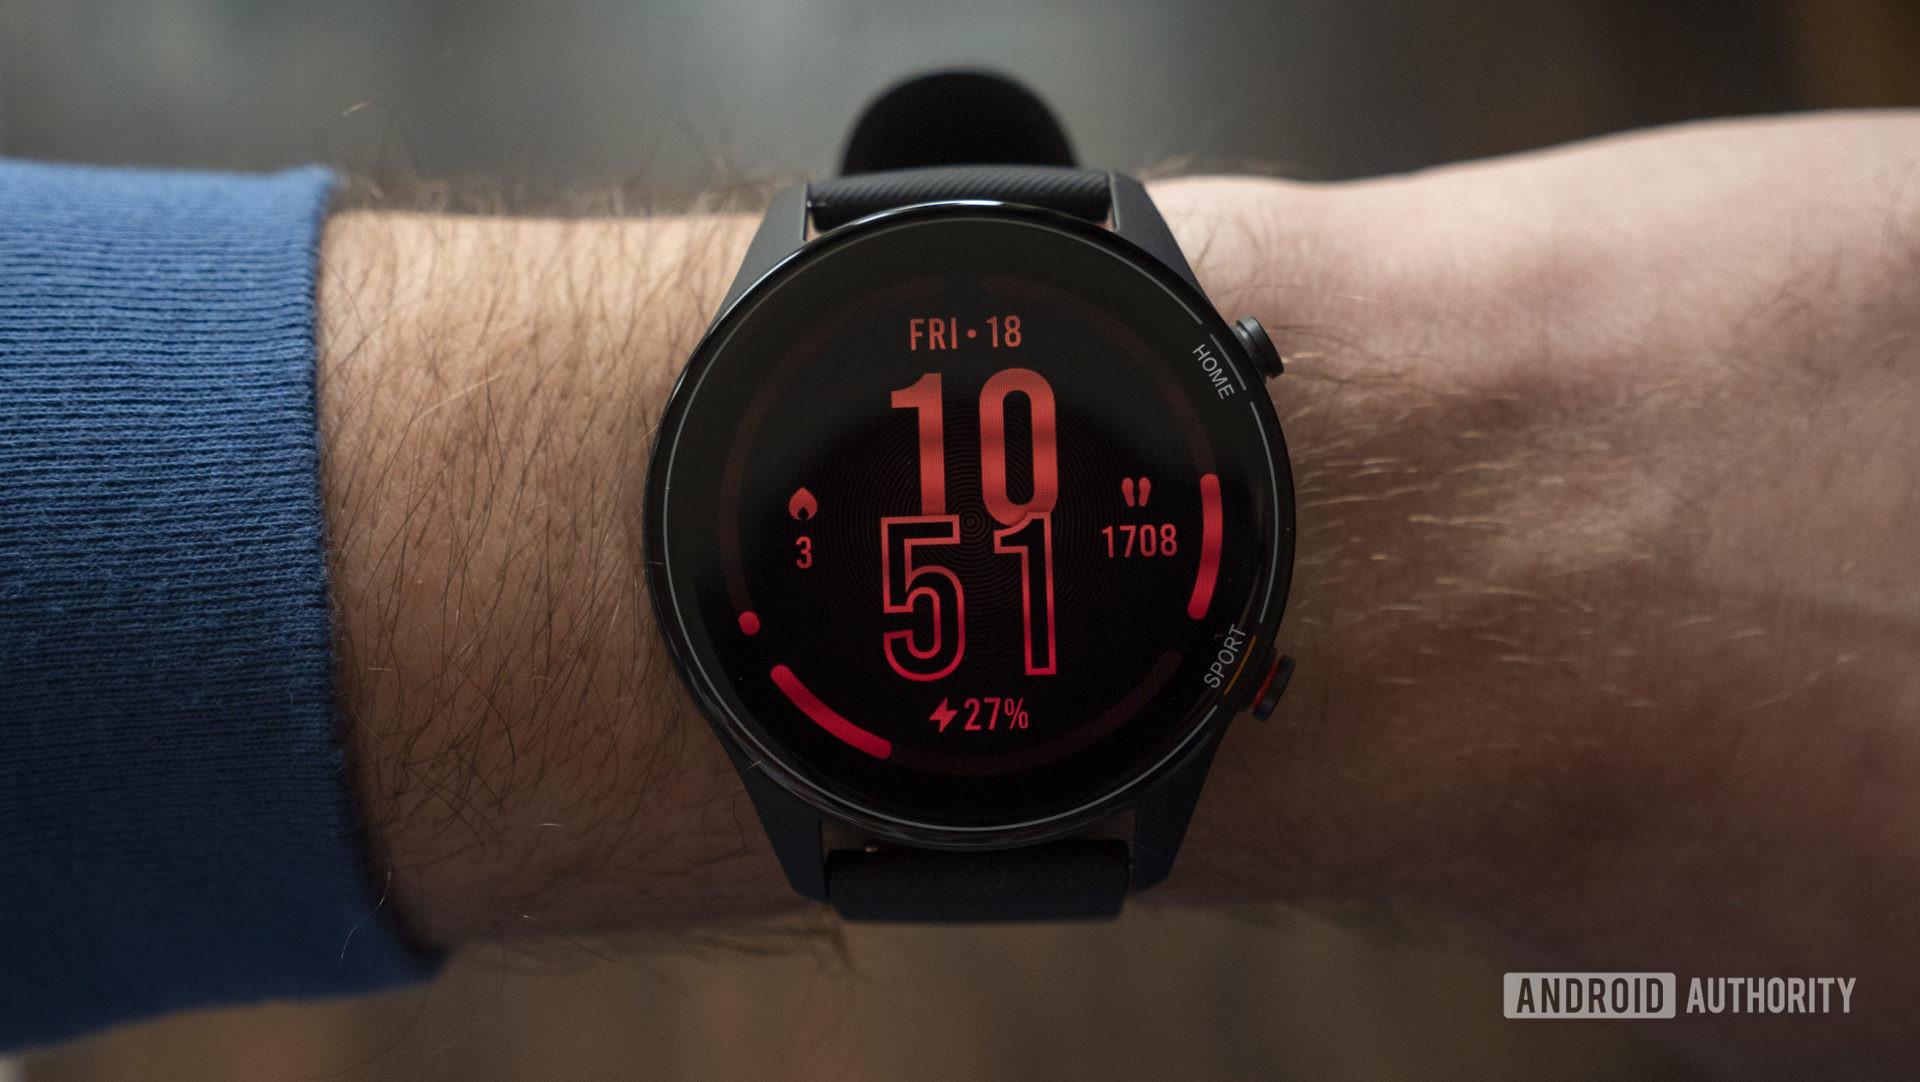 xiaomi mi watch review watch face display on wrist 1